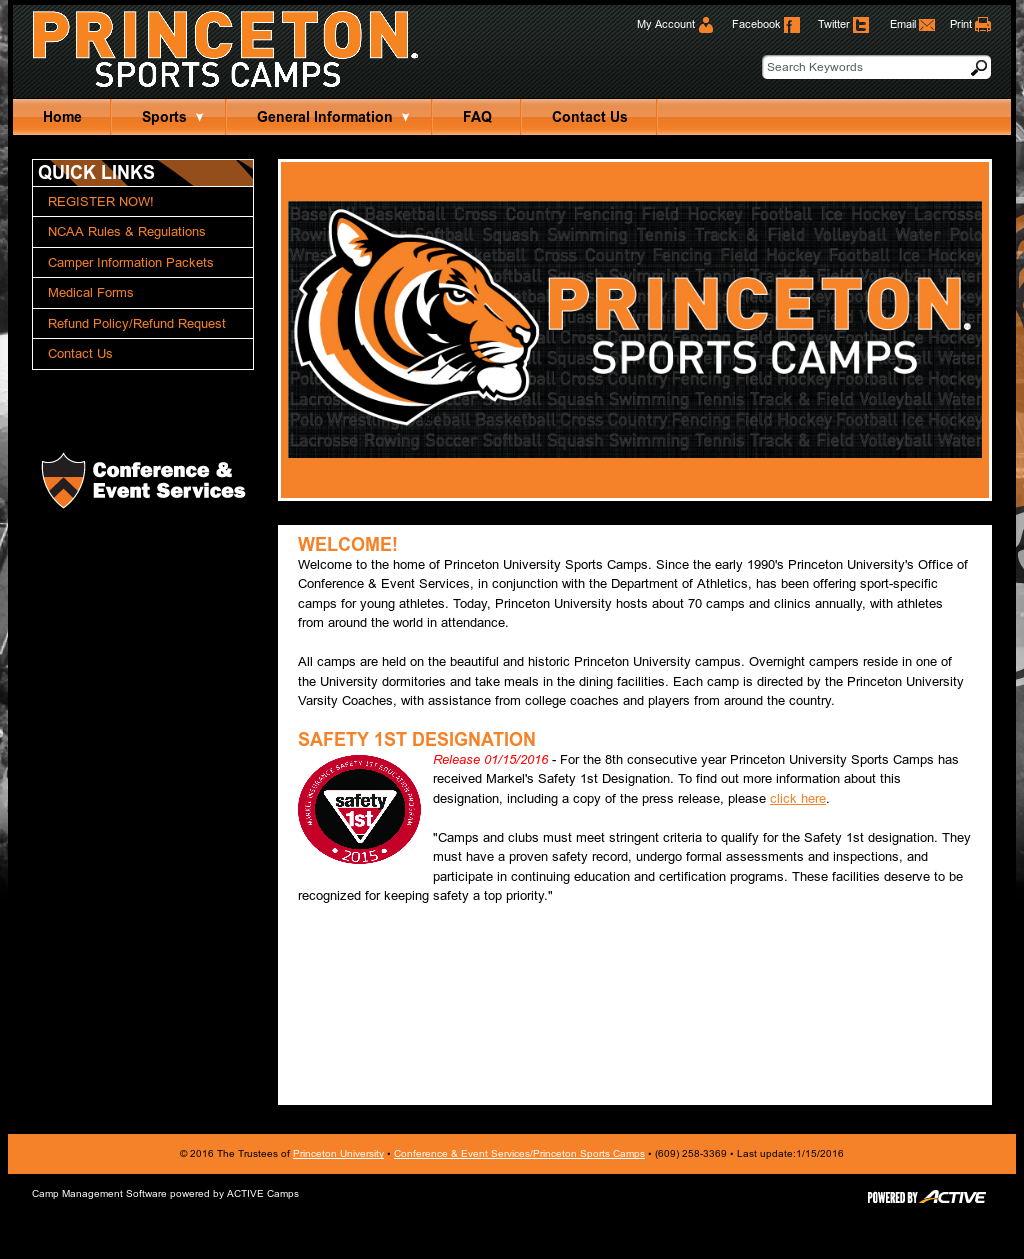 Princeton University Sports Camps Competitors, Revenue and